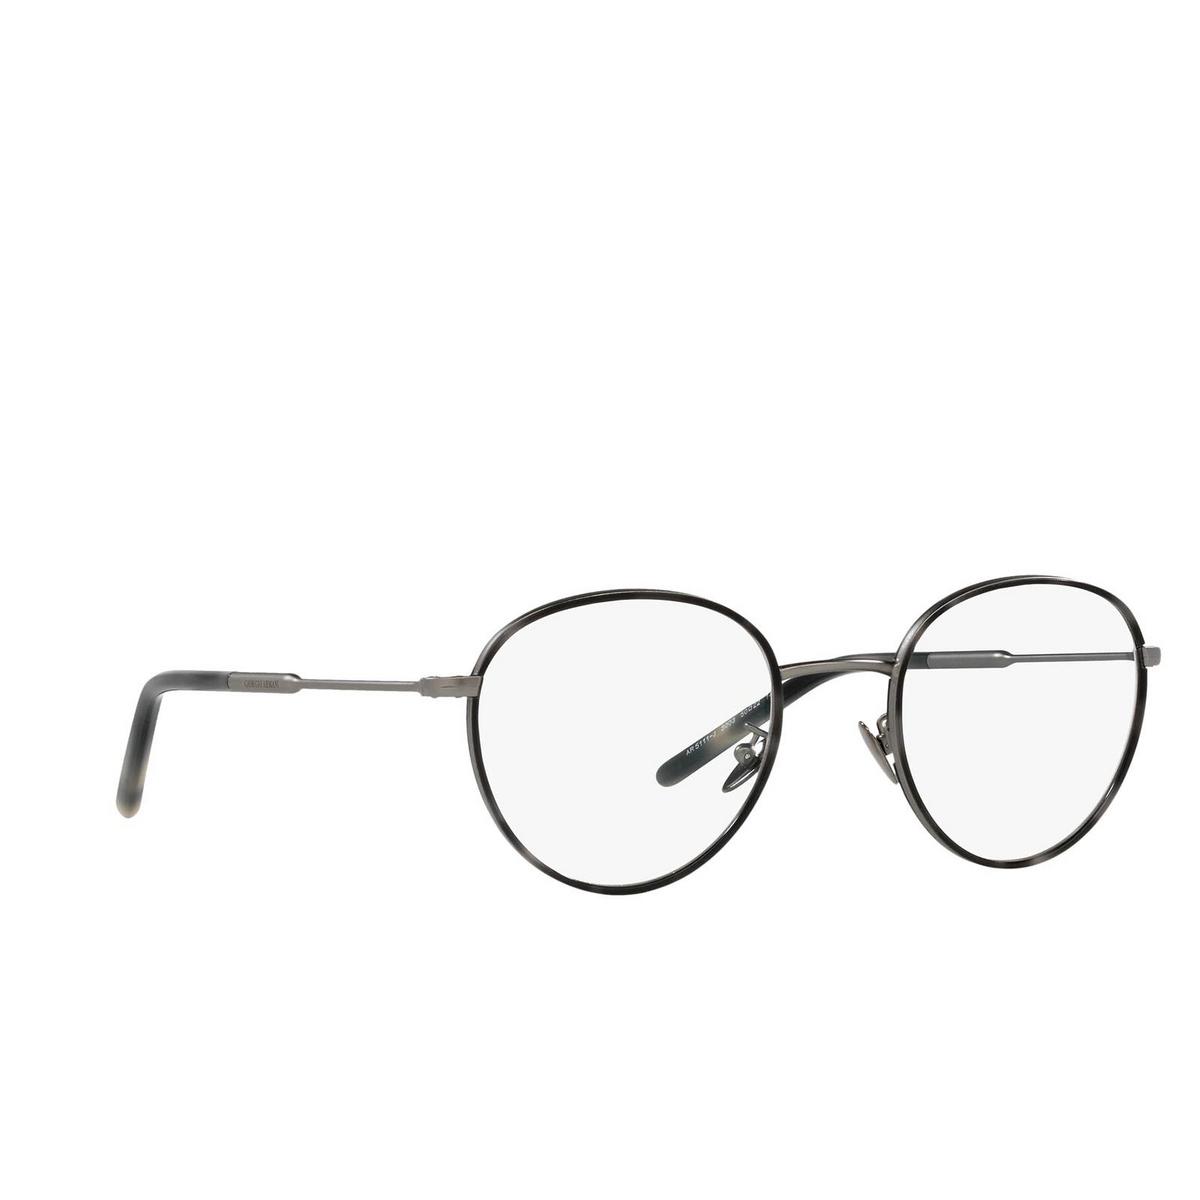 Giorgio Armani® Round Eyeglasses: AR5111J color Matte Gunmetal 3003 - three-quarters view.